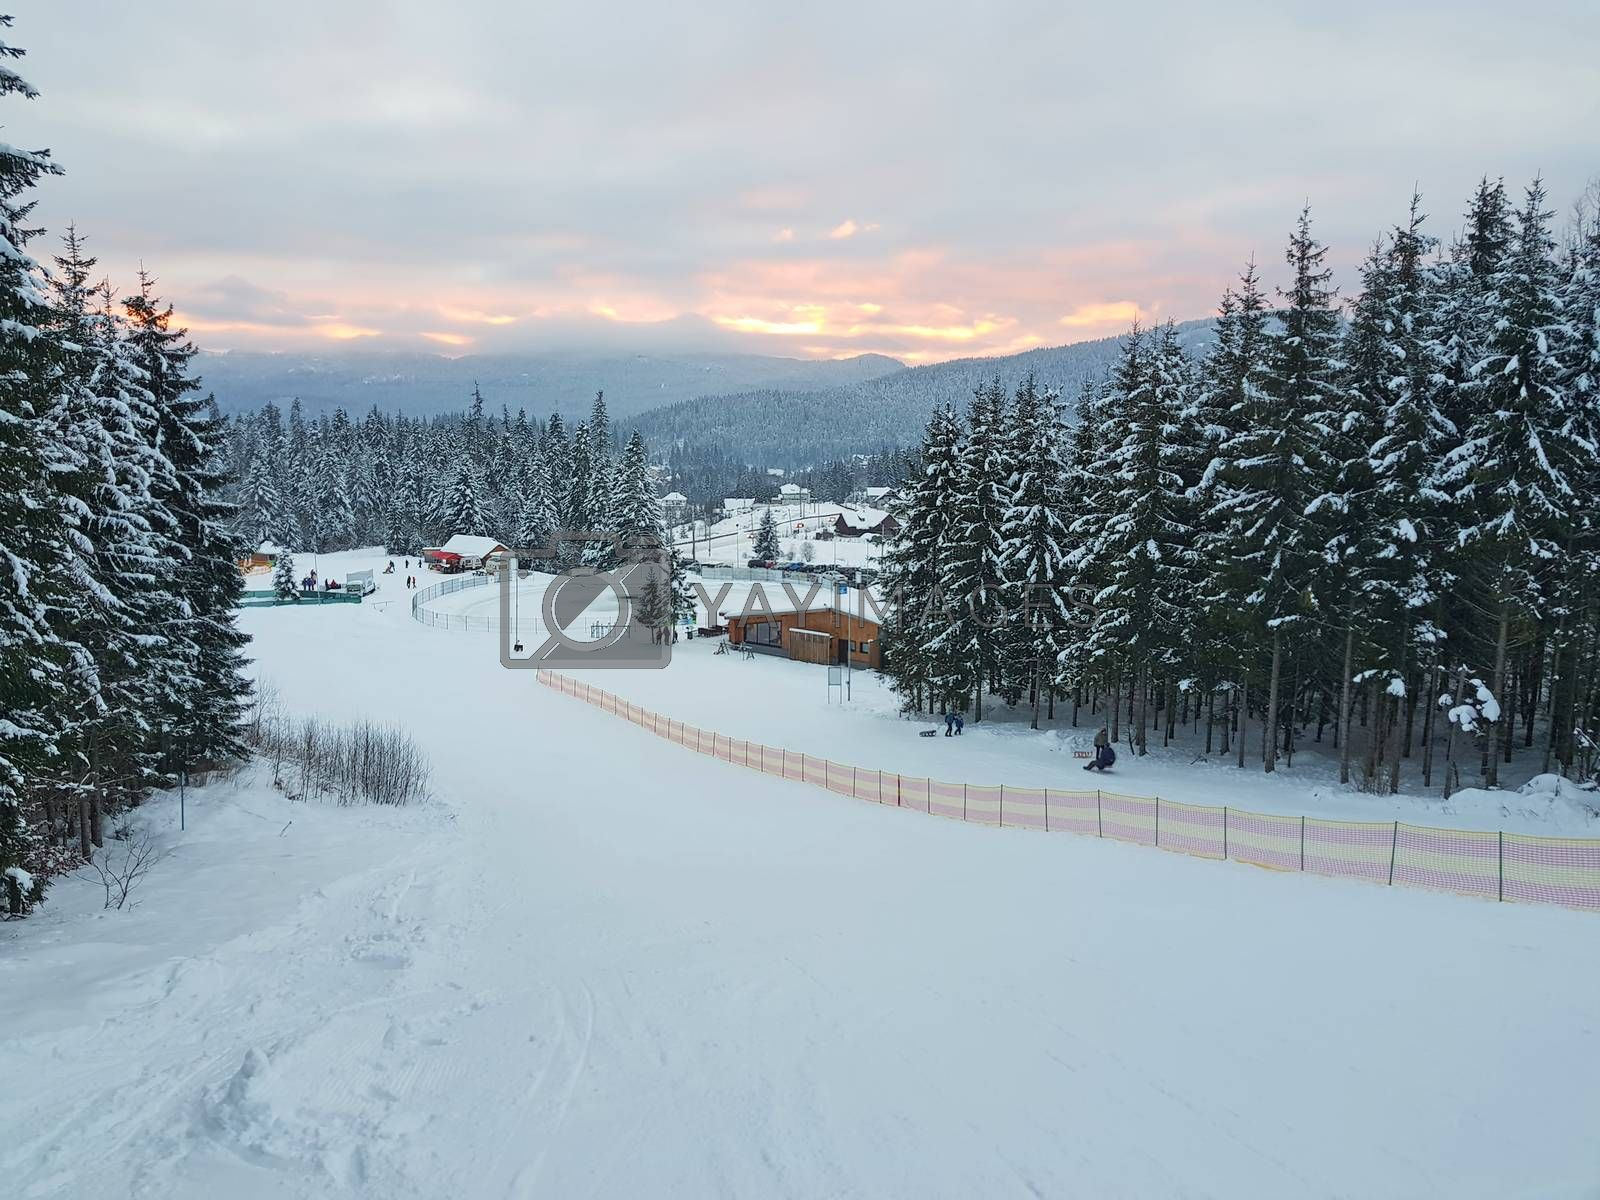 Ski and sled slope in winter resort, mountain winter landscape in Romanian Carpathians.